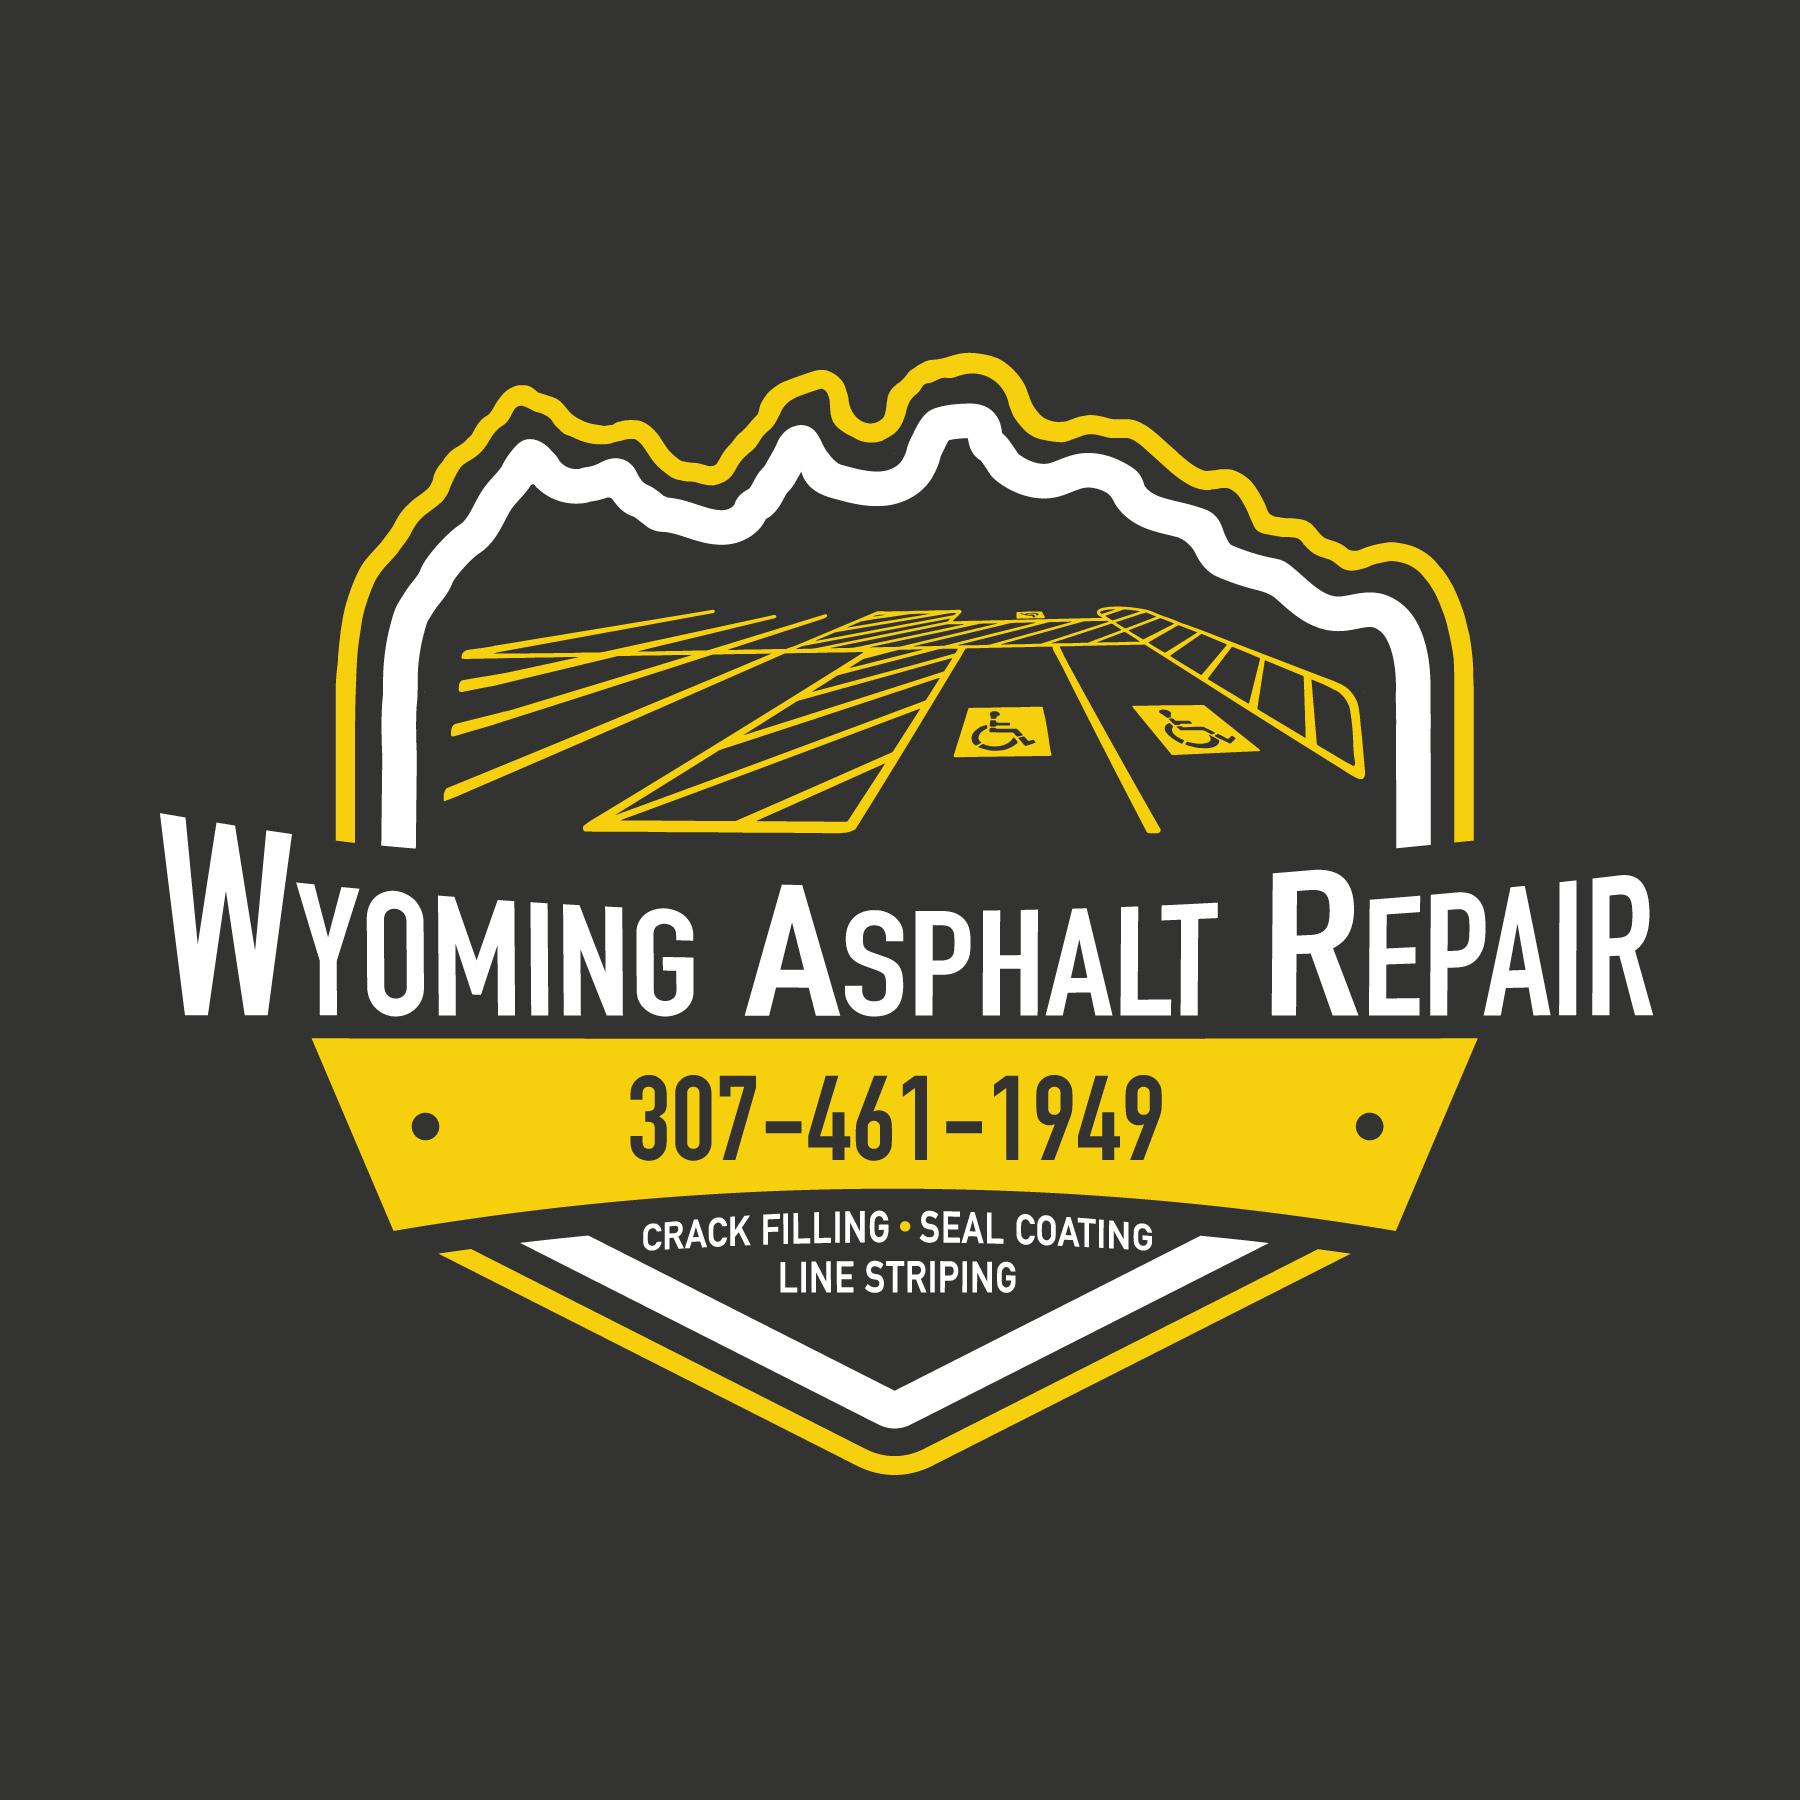 Wyoming Asphalt Repair logo graphic design